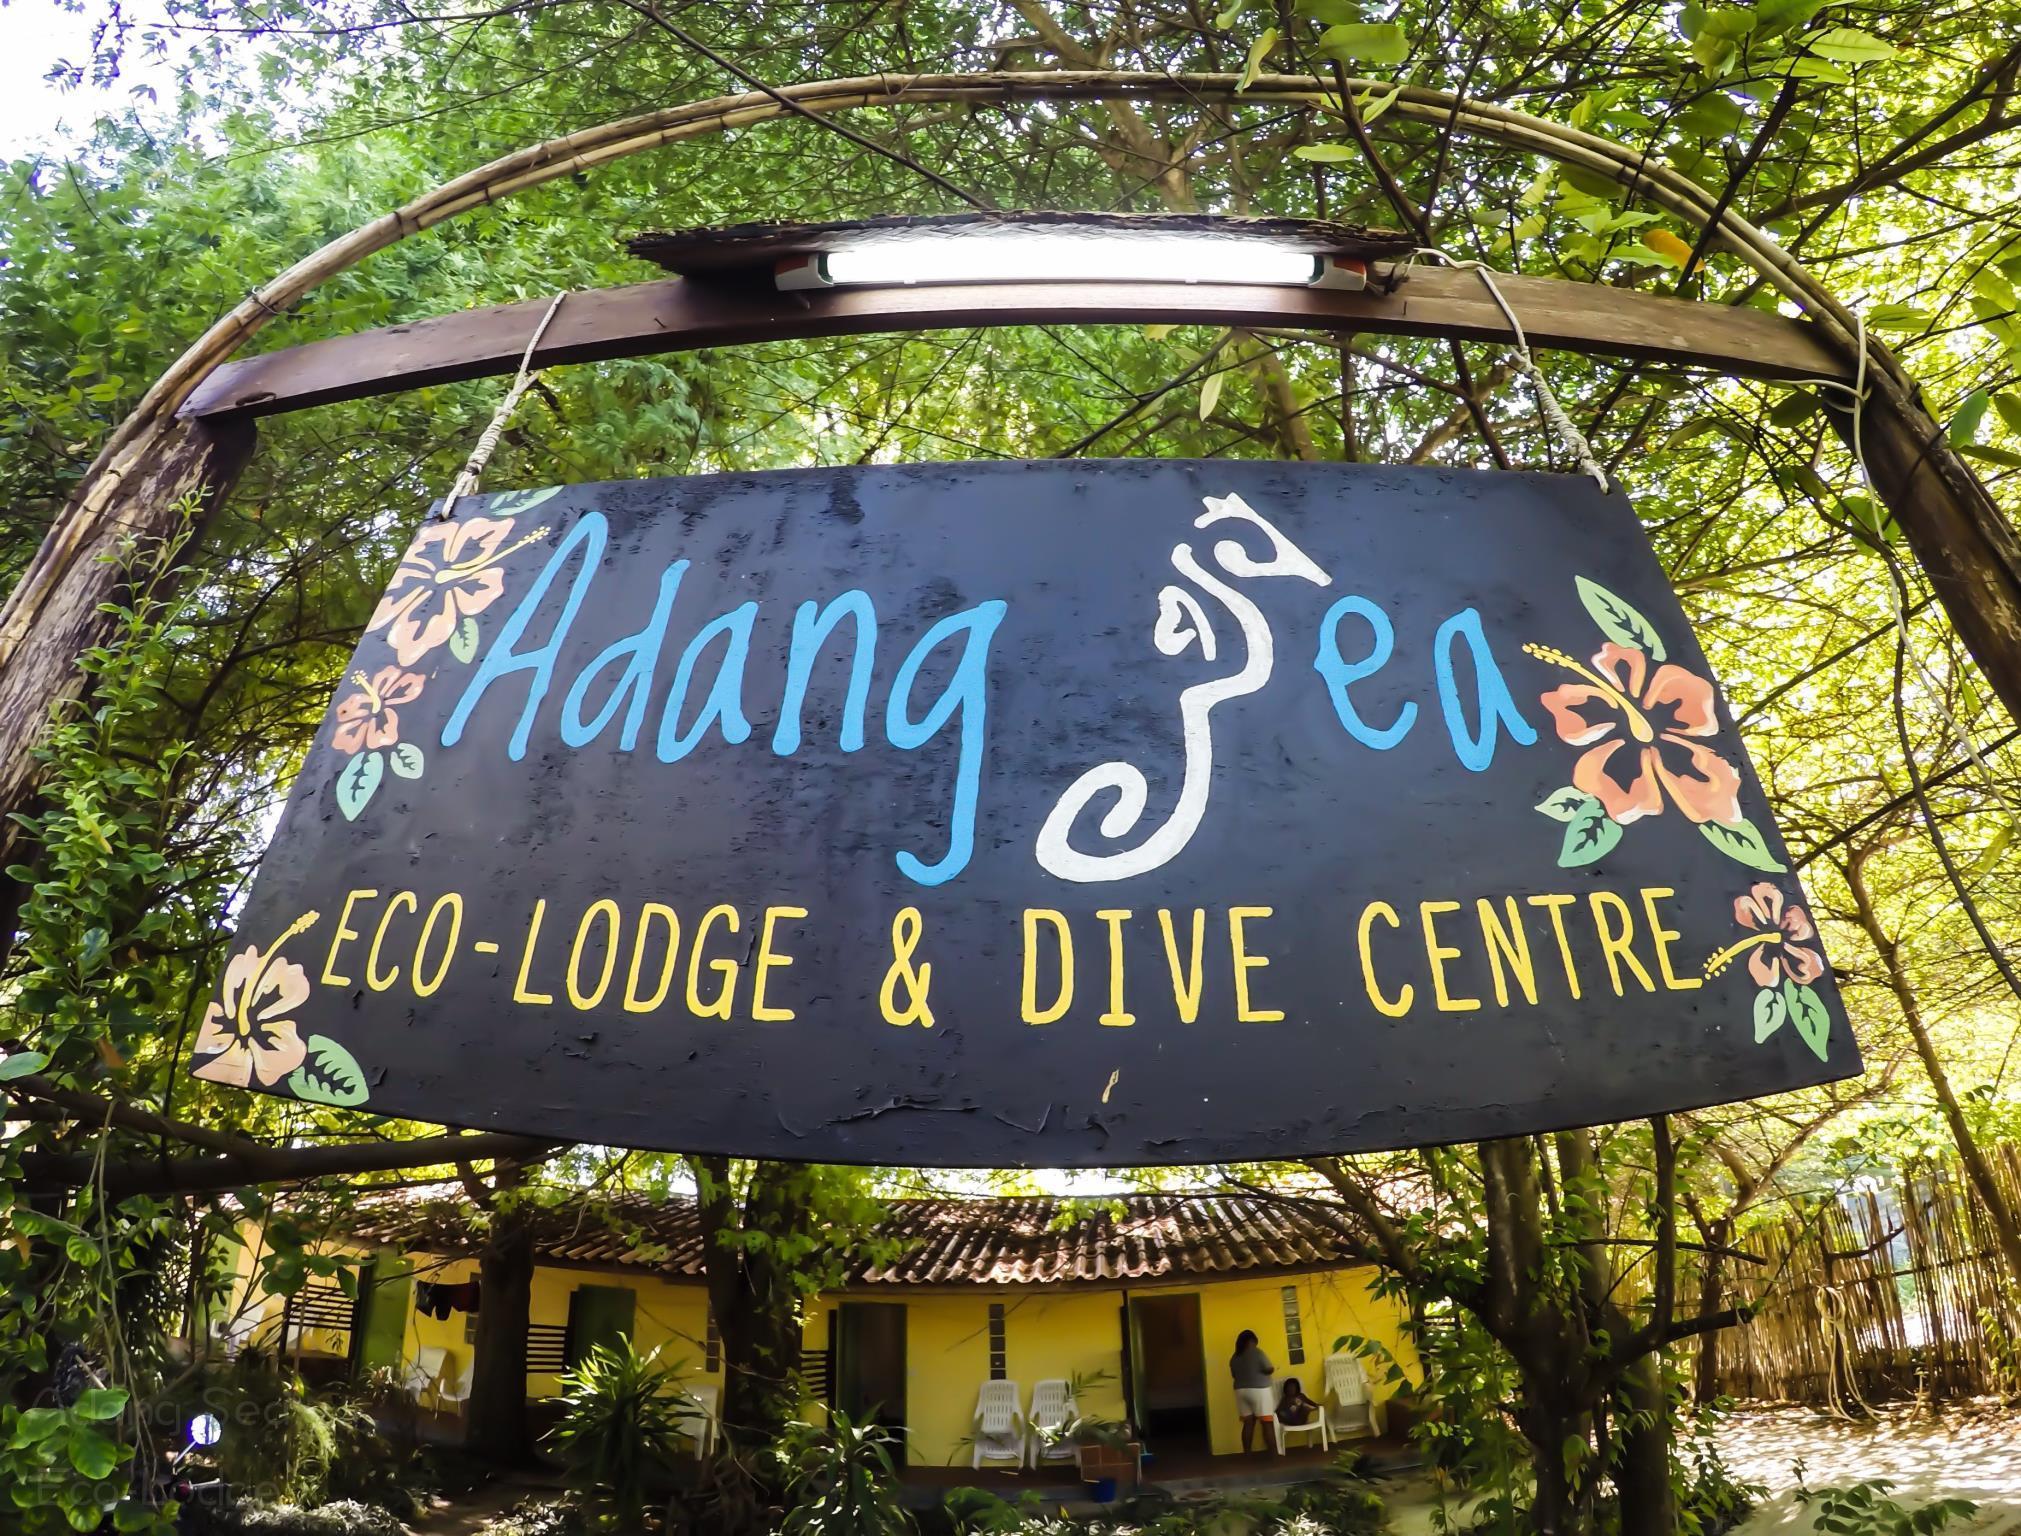 Adang Sea Eco-Lodge 阿当海洋生态旅舍